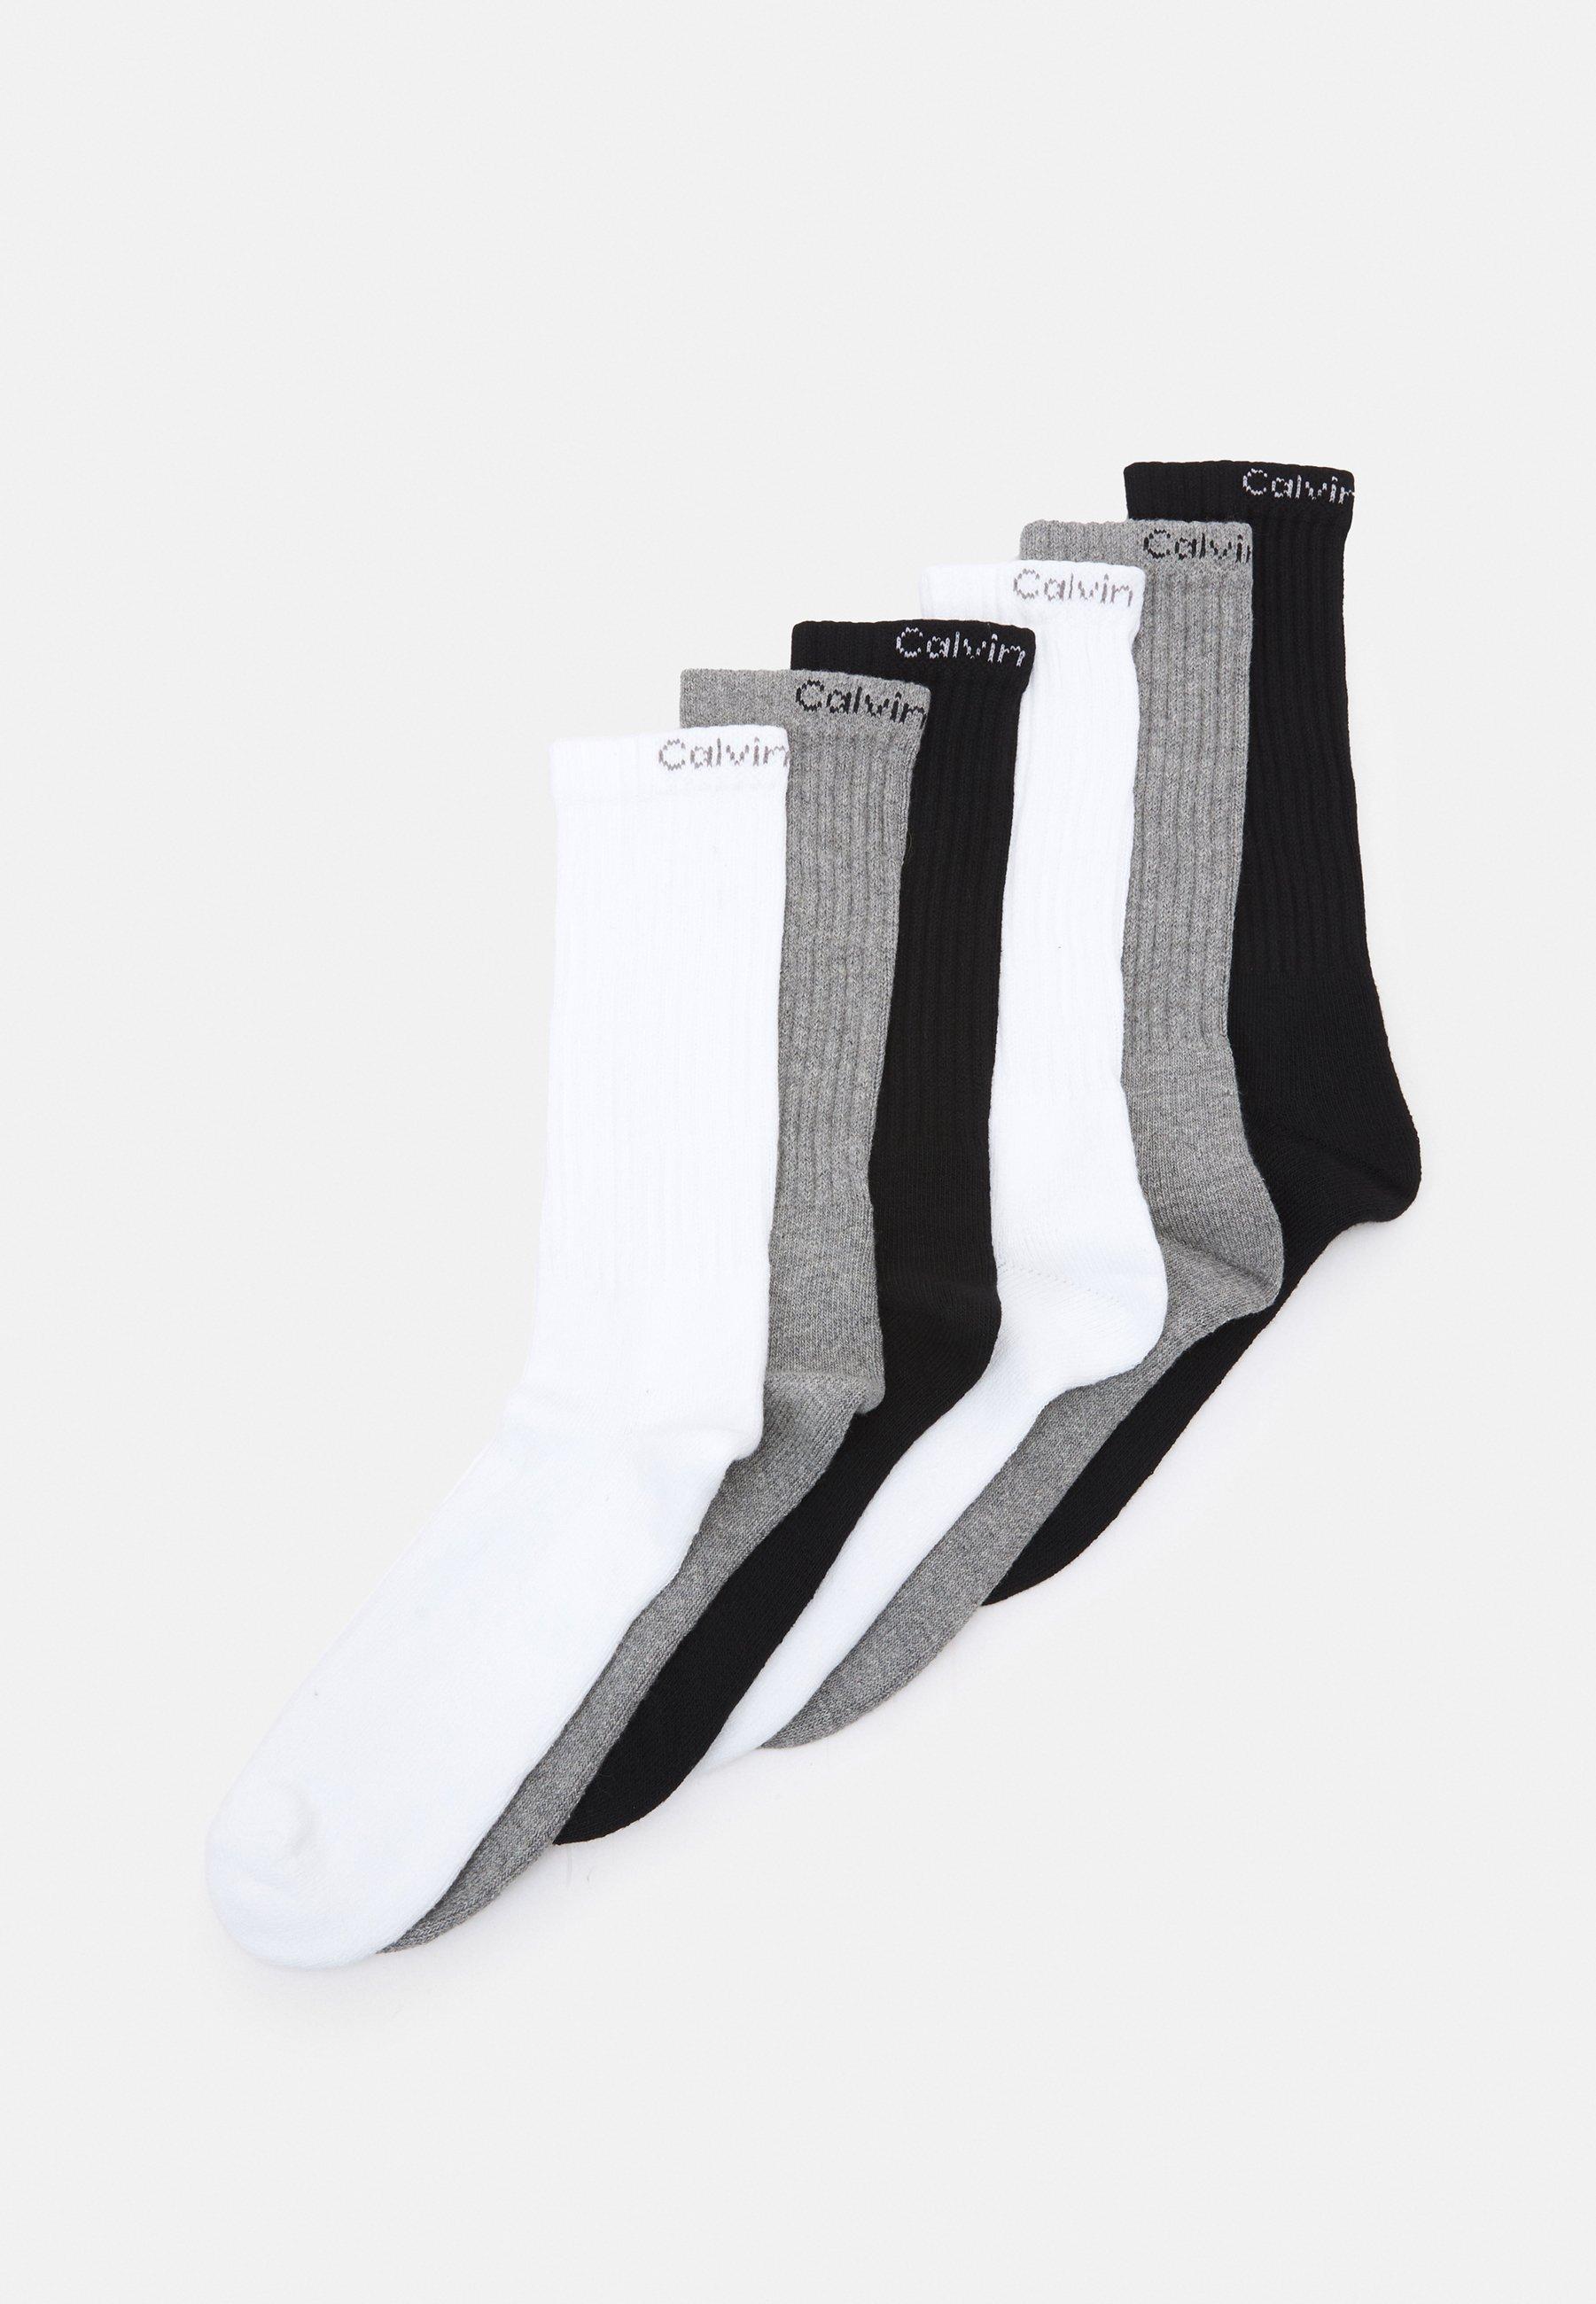 Femme SOCK 6 PACK UNISEX - Chaussettes